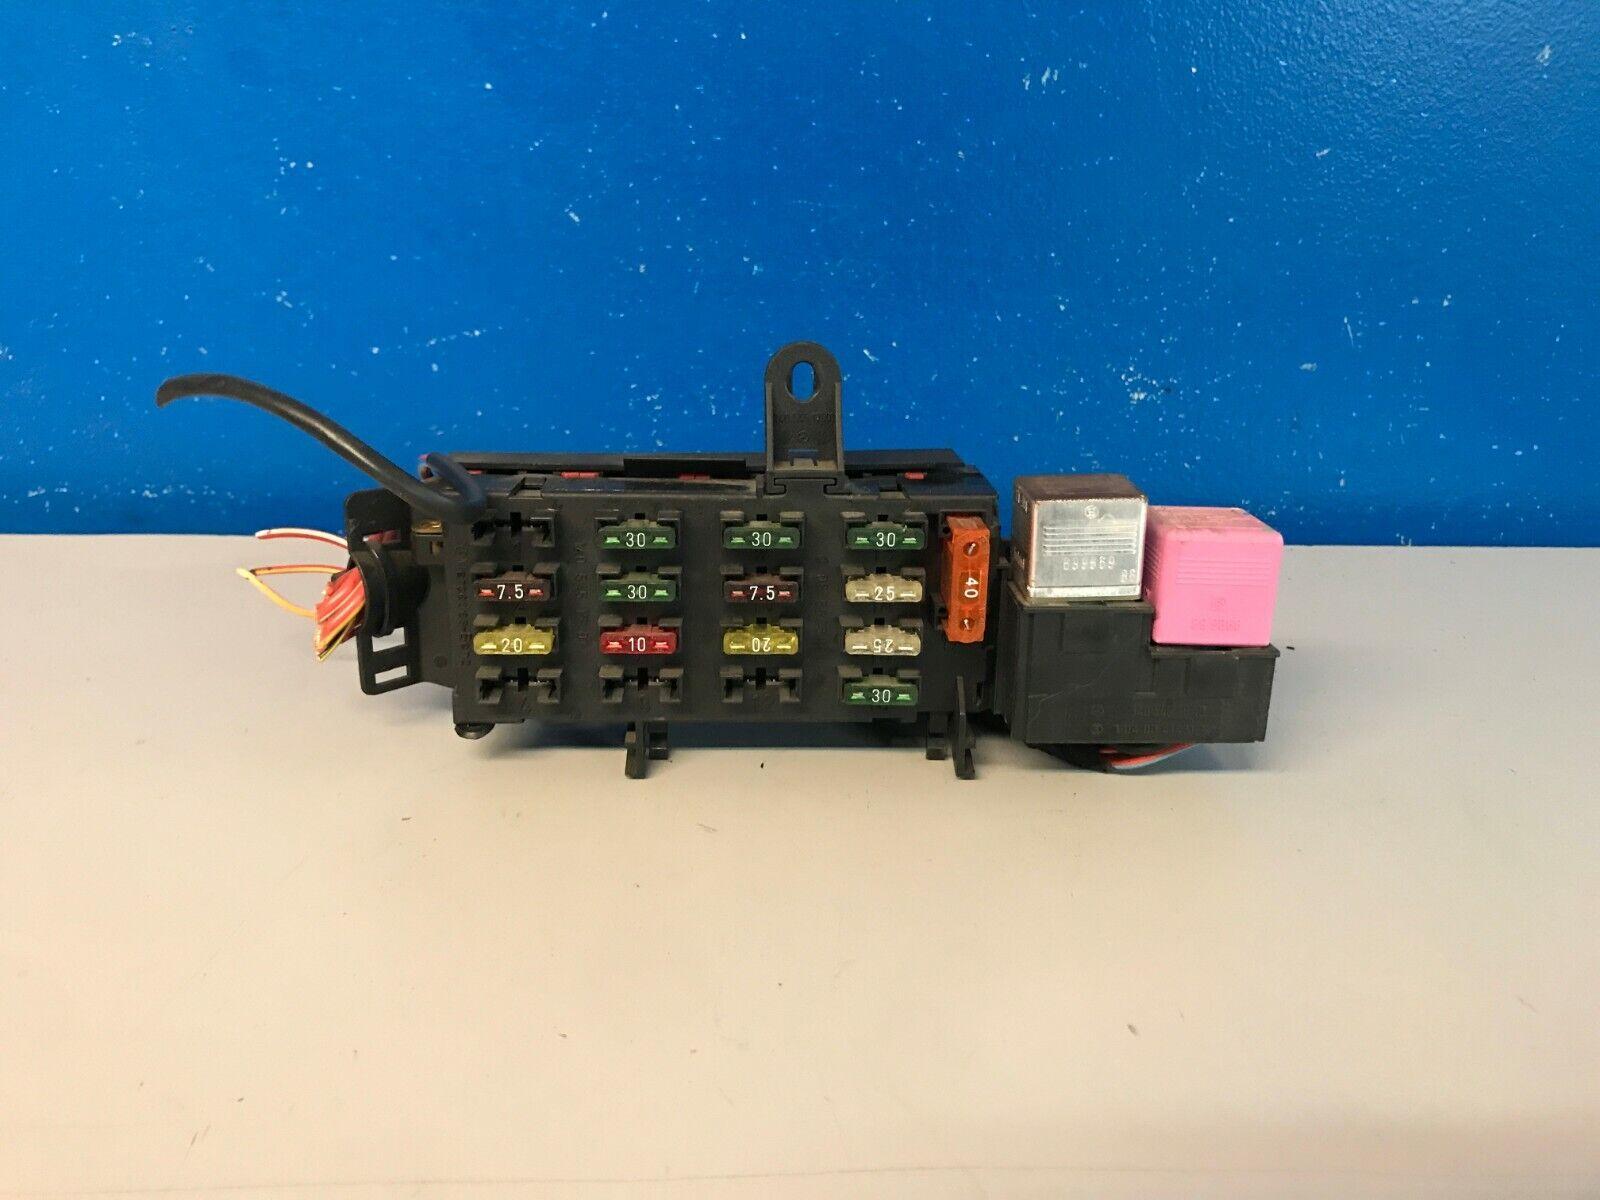 Mercede S420 Fuse Box - 88 Wiring Diagram